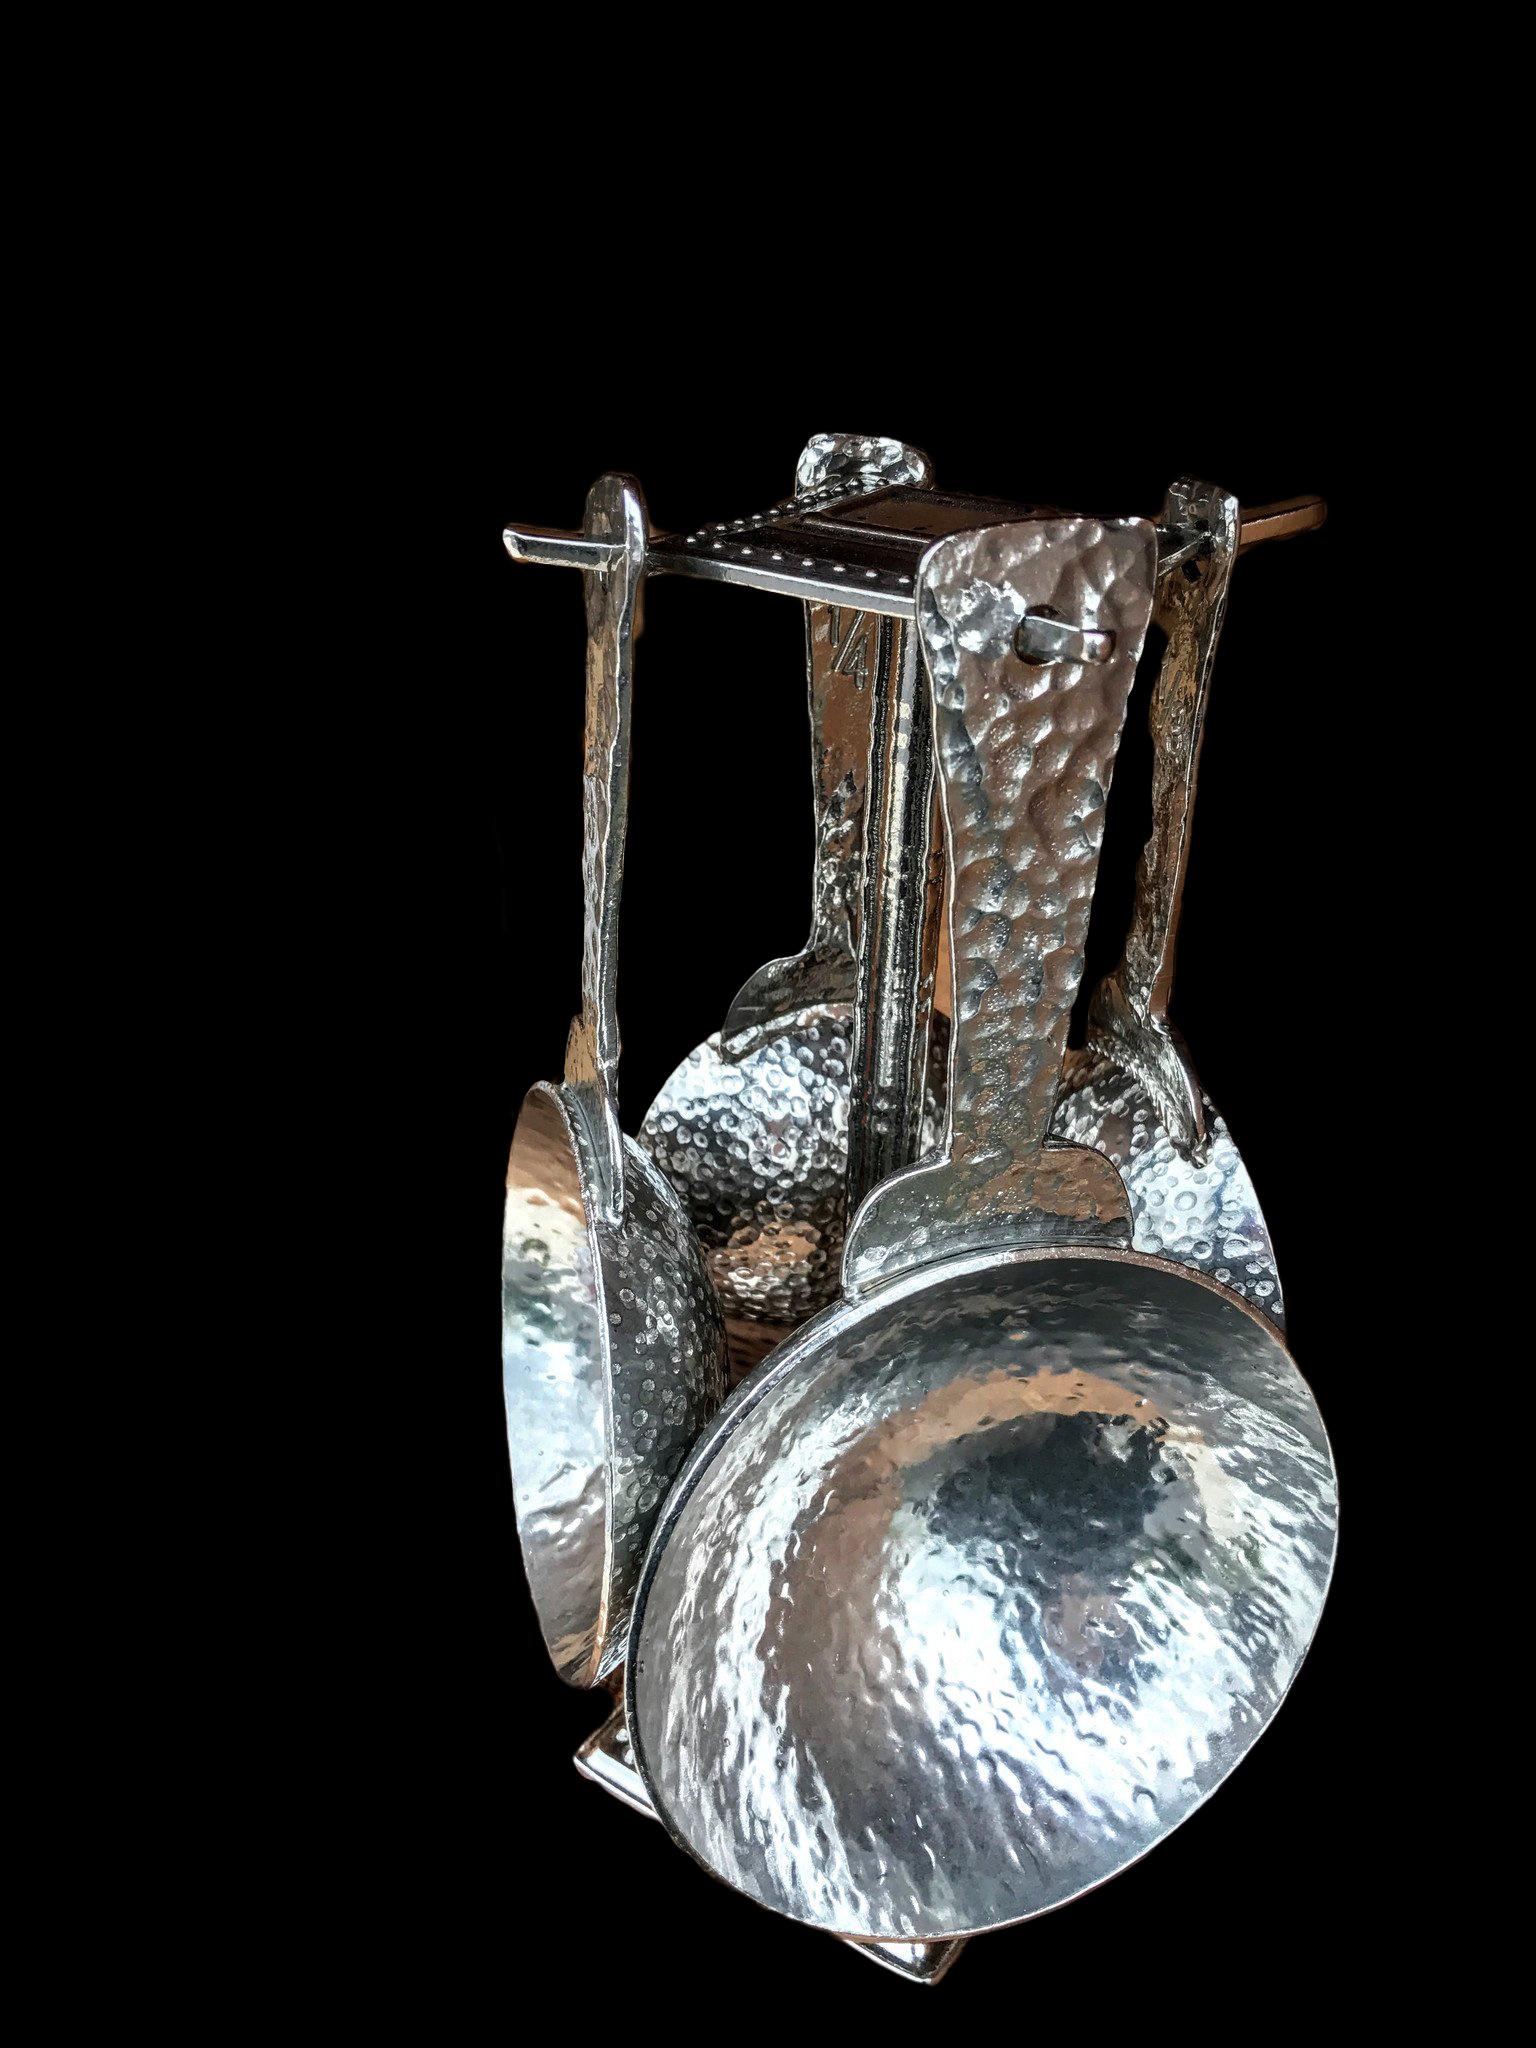 Roman Measuring Cups w/ Post-1